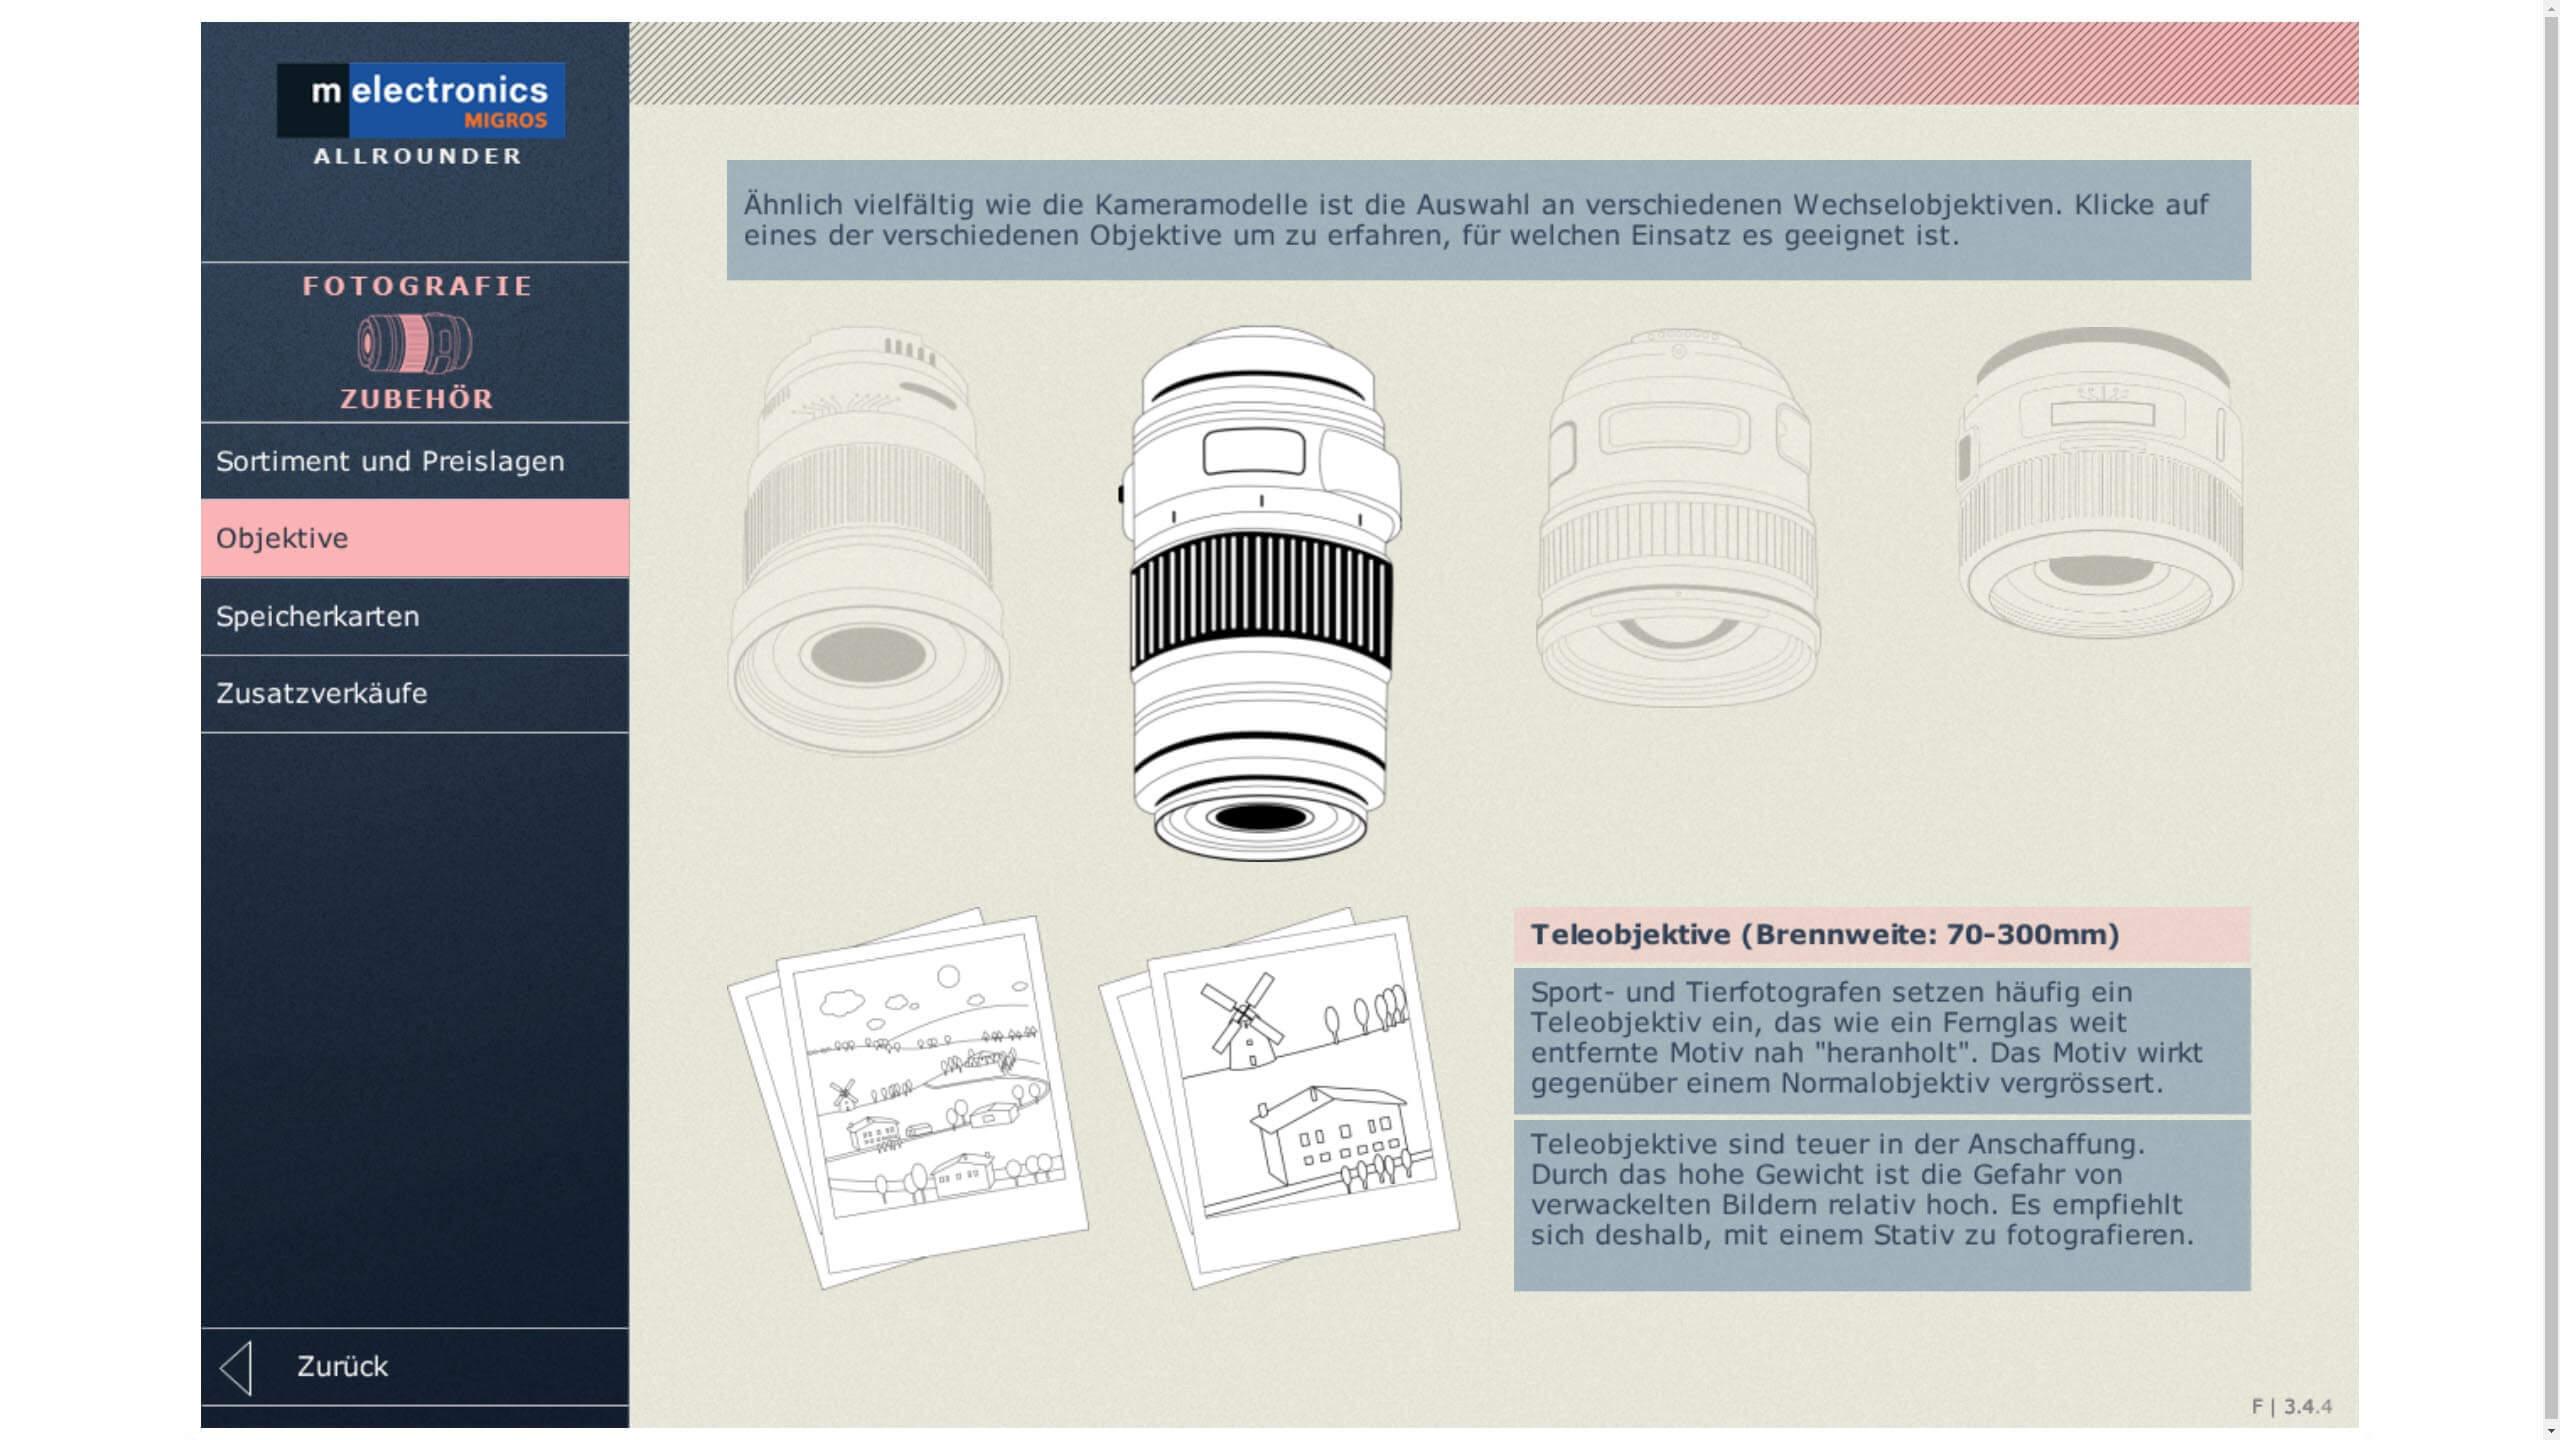 melectronics Kameraeinstellungen